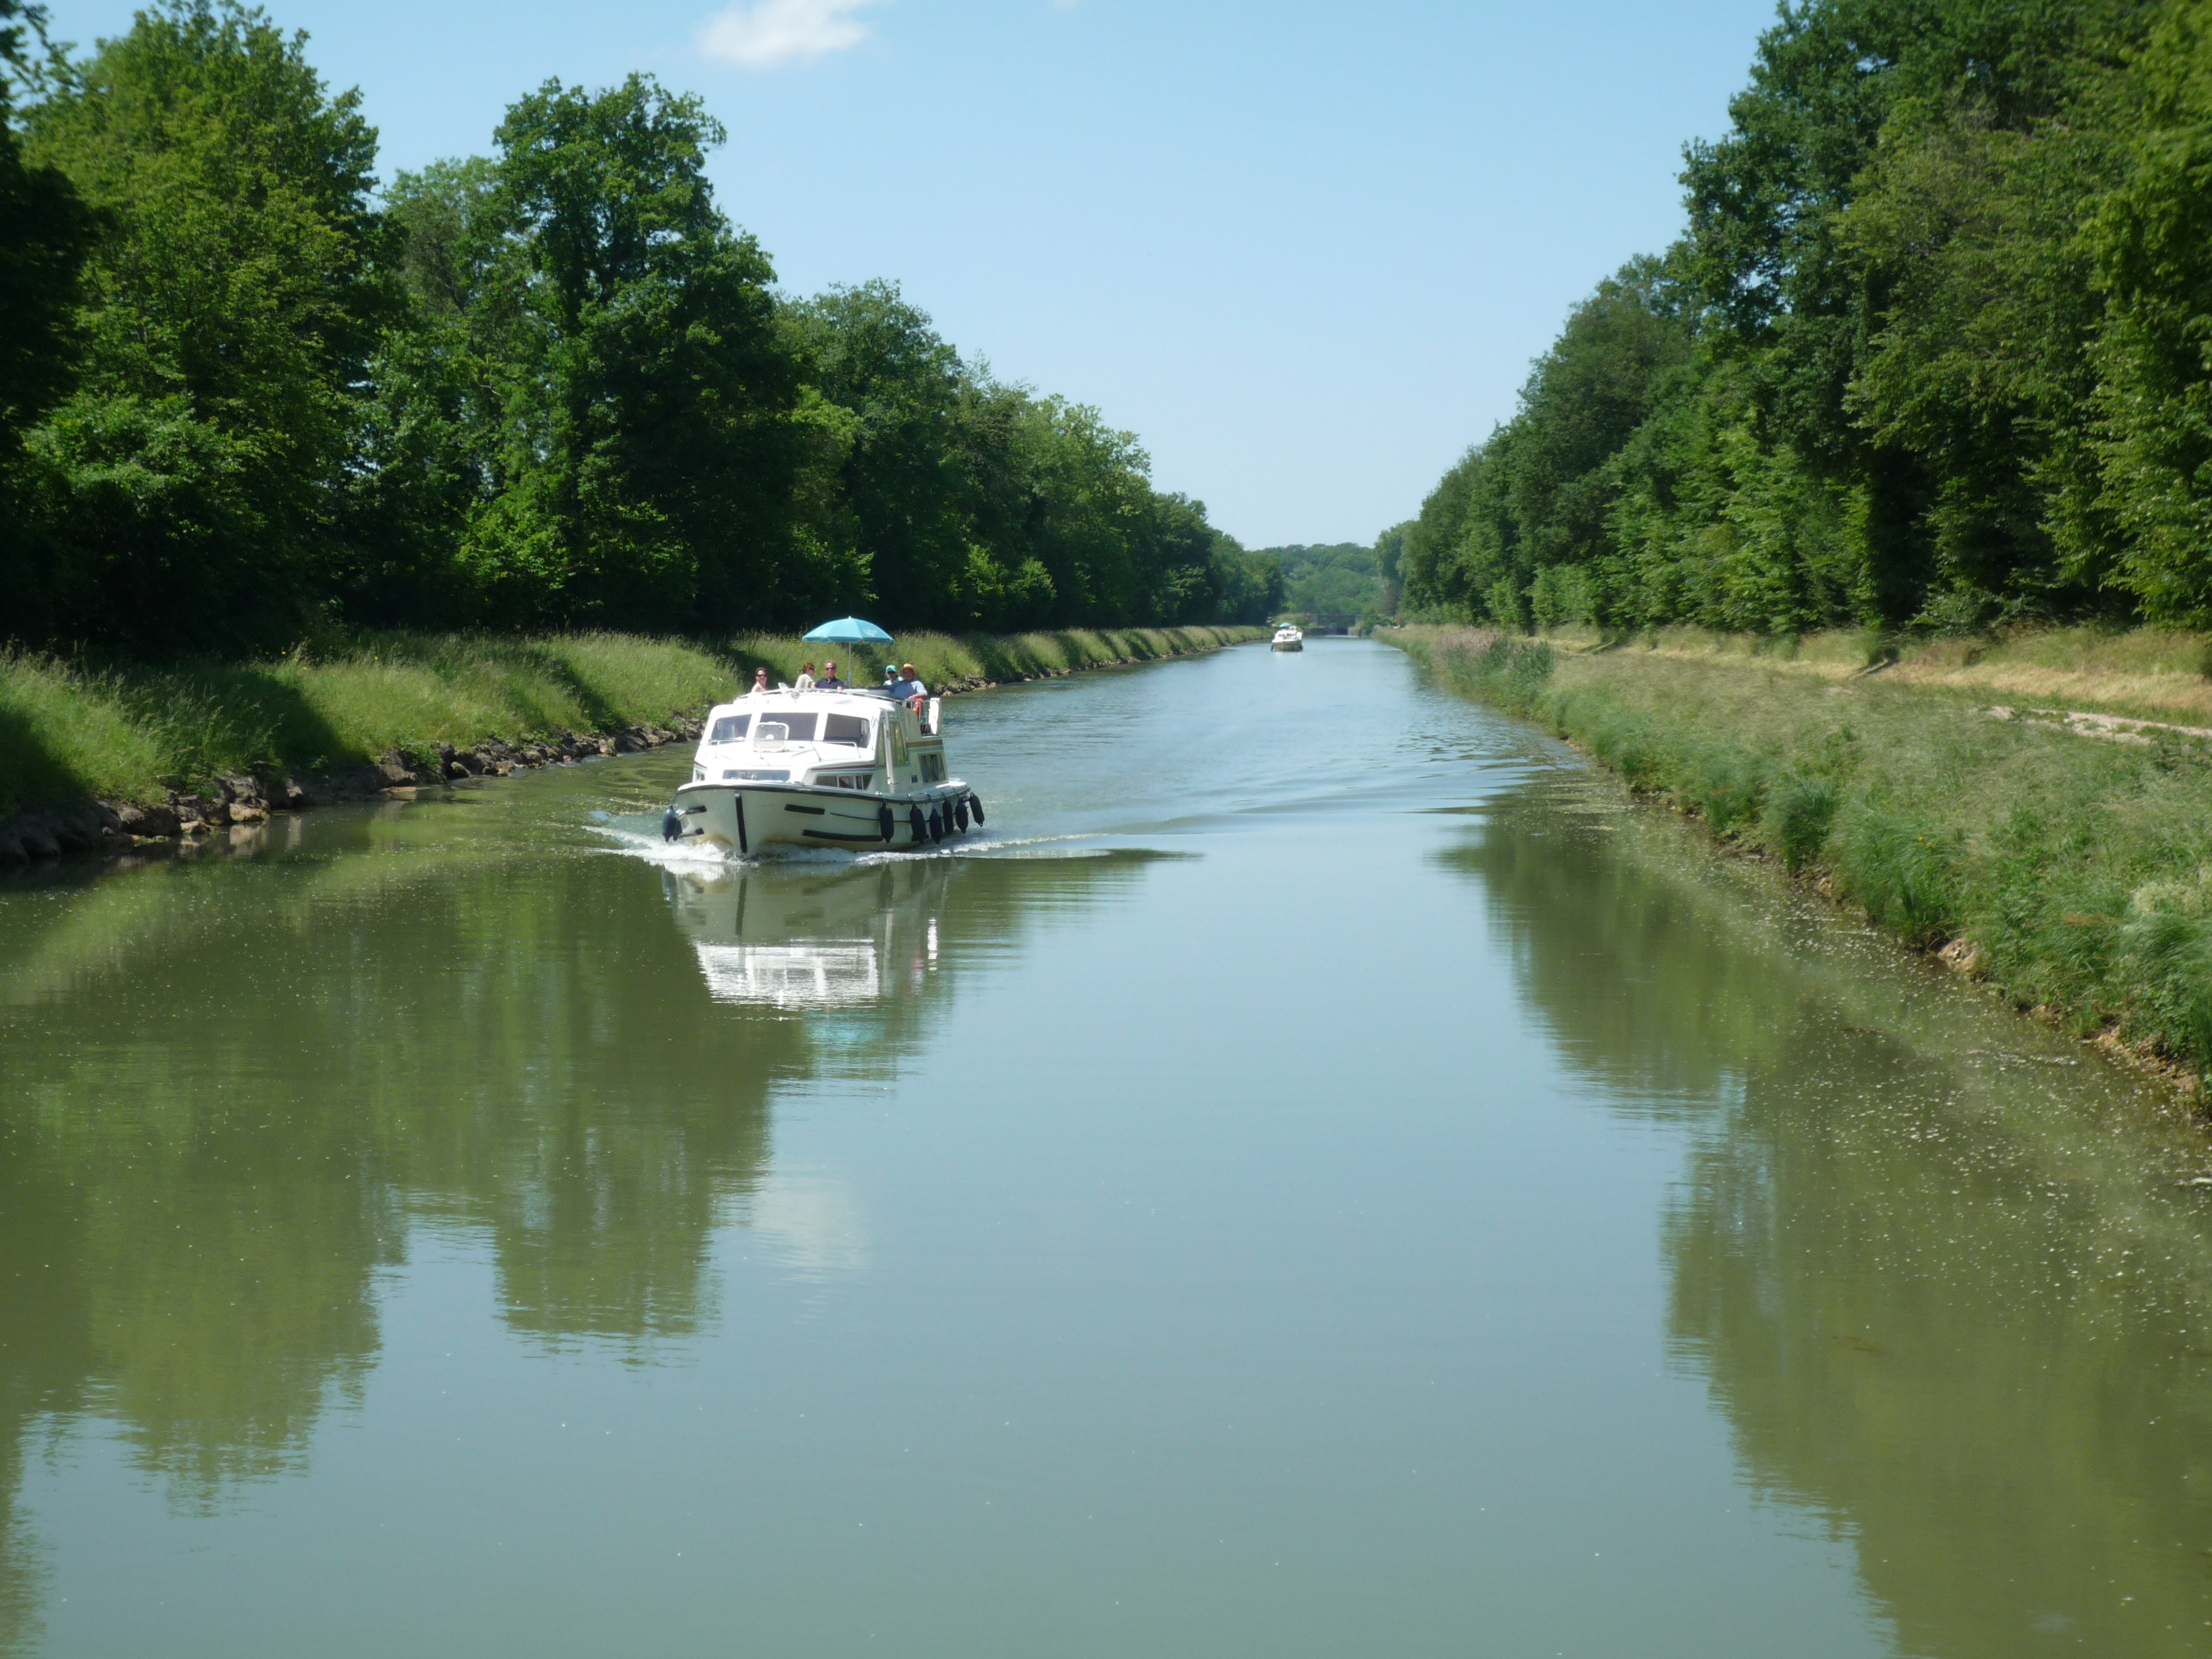 St Jean De Losne (Le Boat)